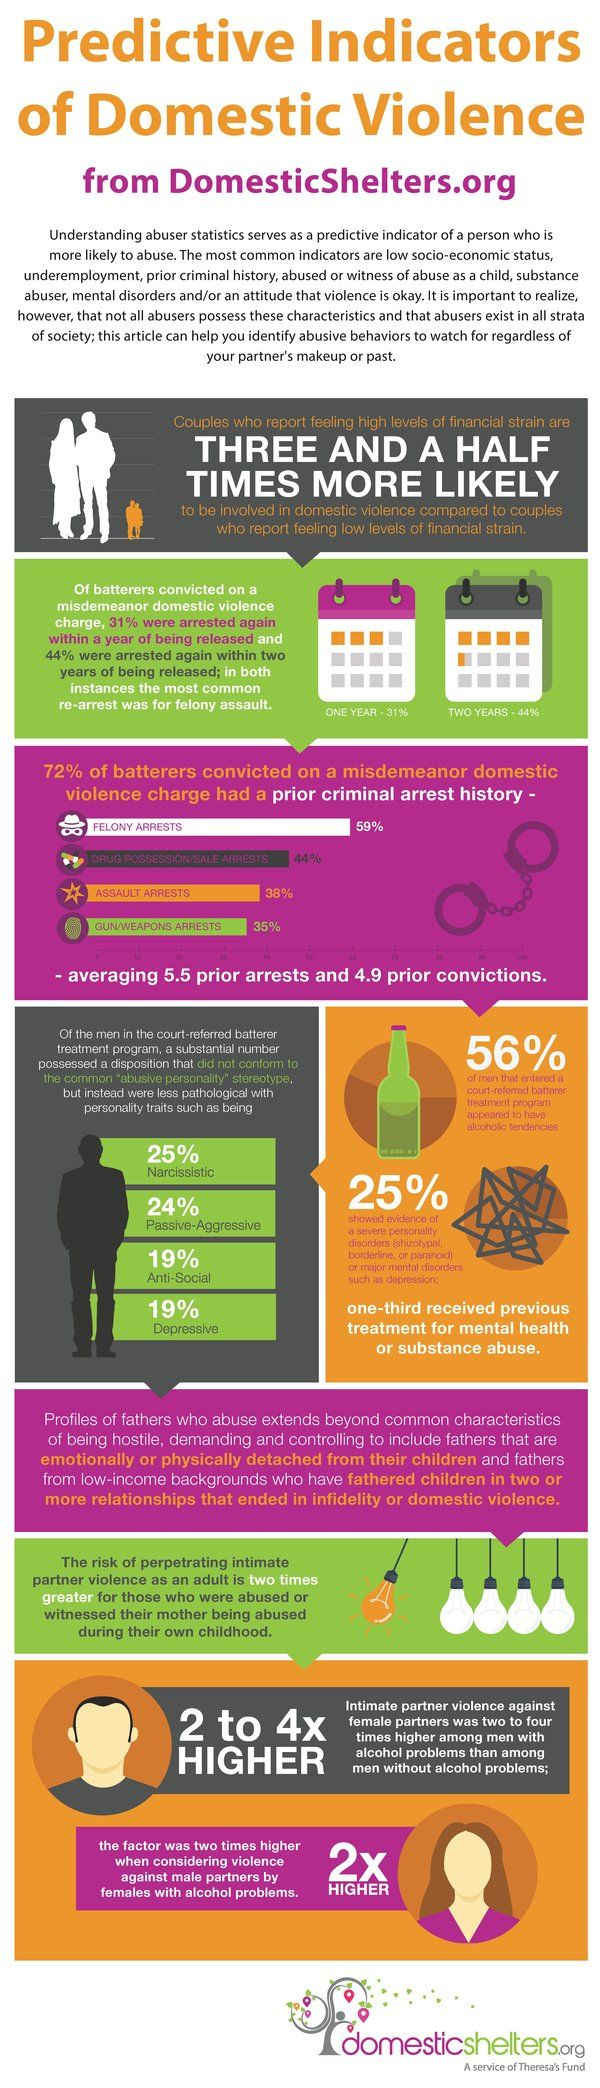 Predictive Indicators of Domestic Violence